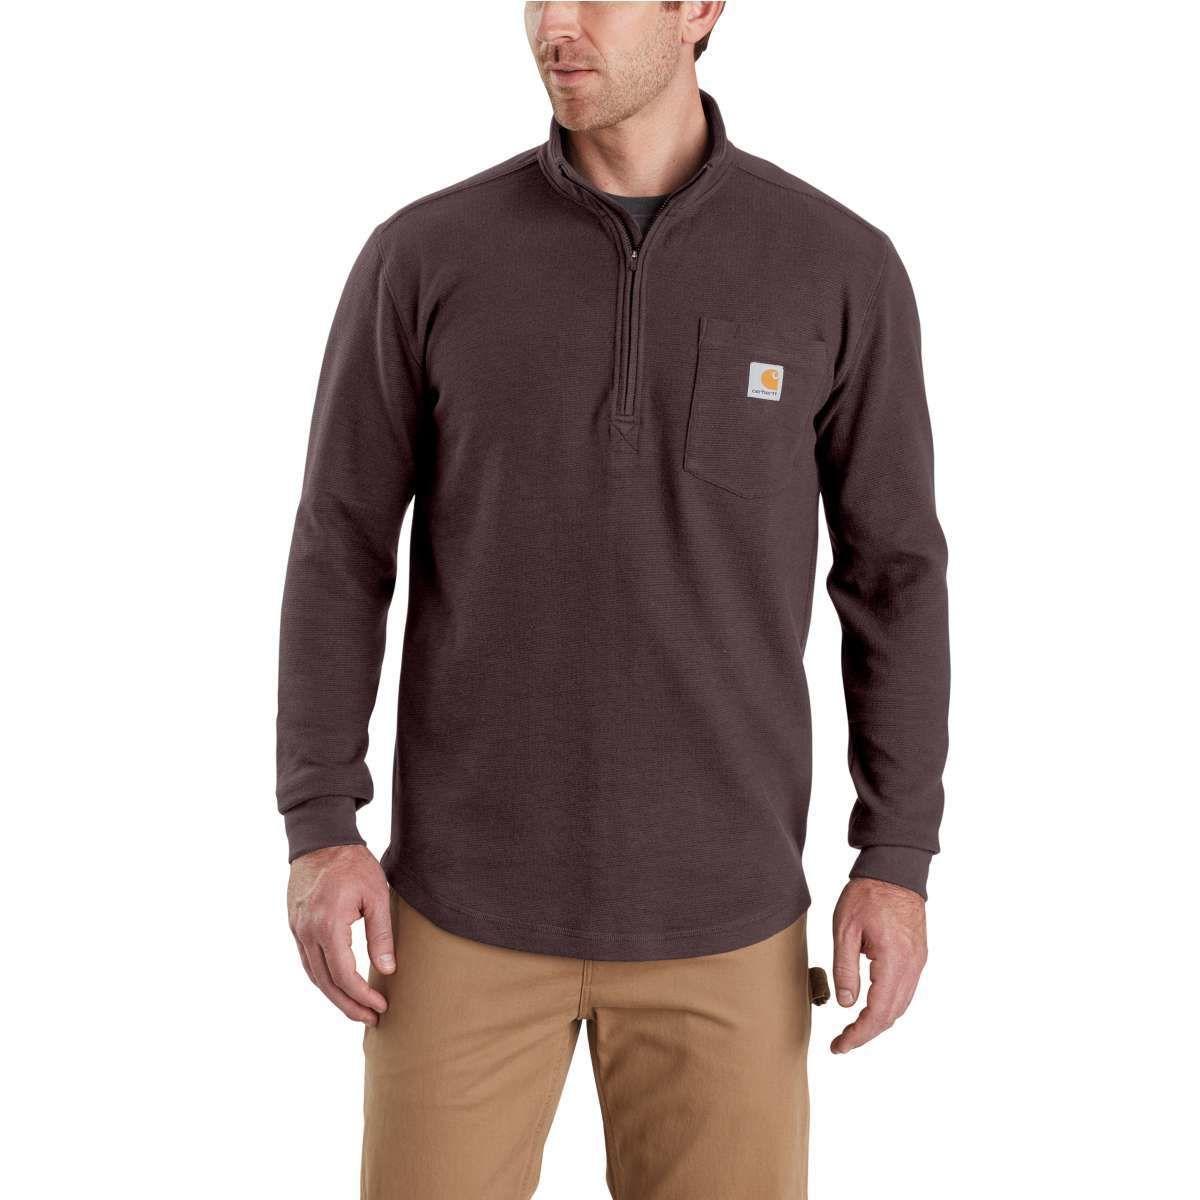 Carhartt Men's Tilden Long-Sleeve Waffle Knit Half-Zip Pullover - Red, XXL